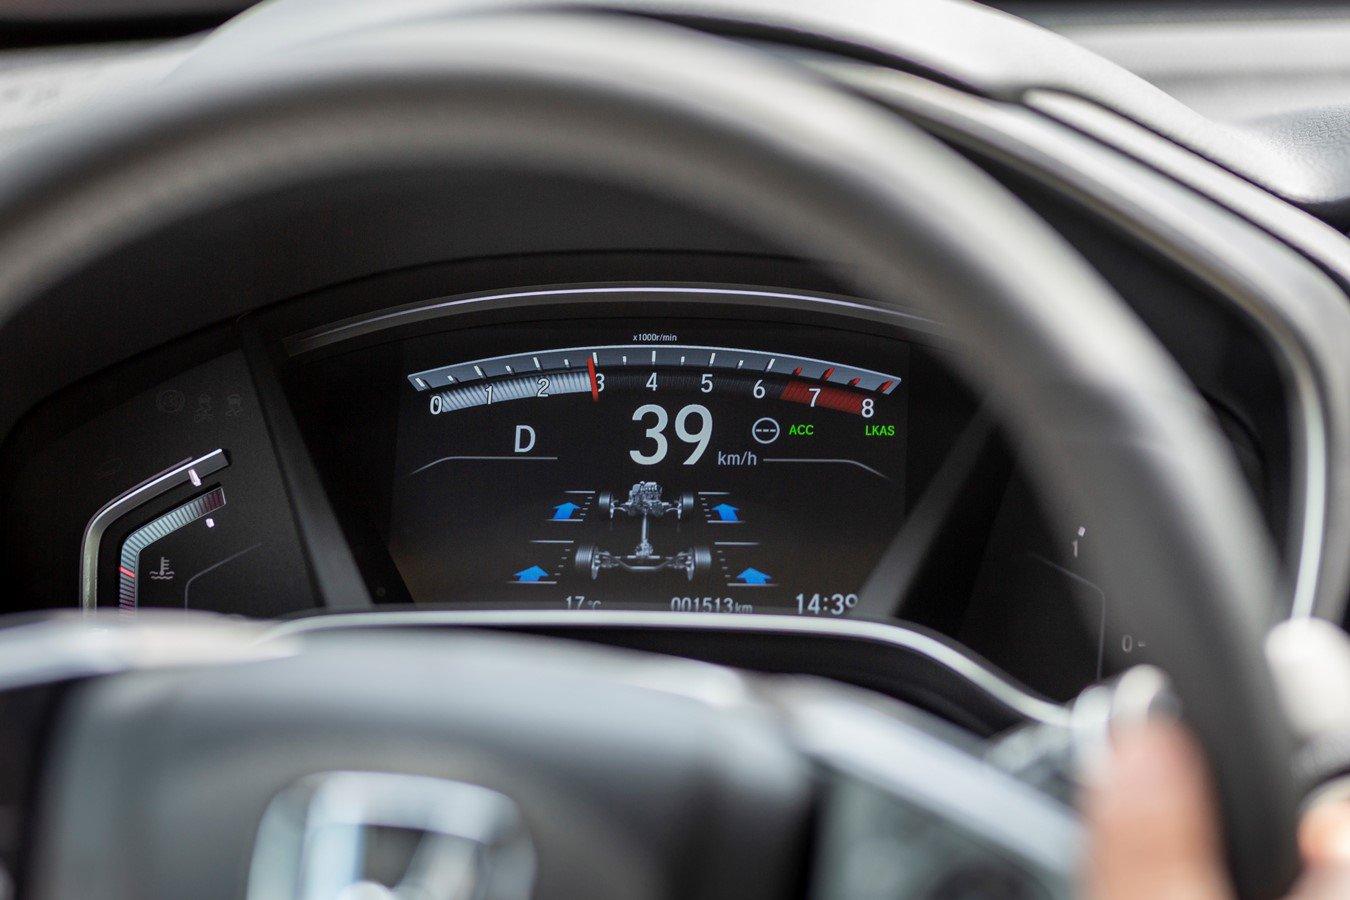 Honda CR-V dashpod